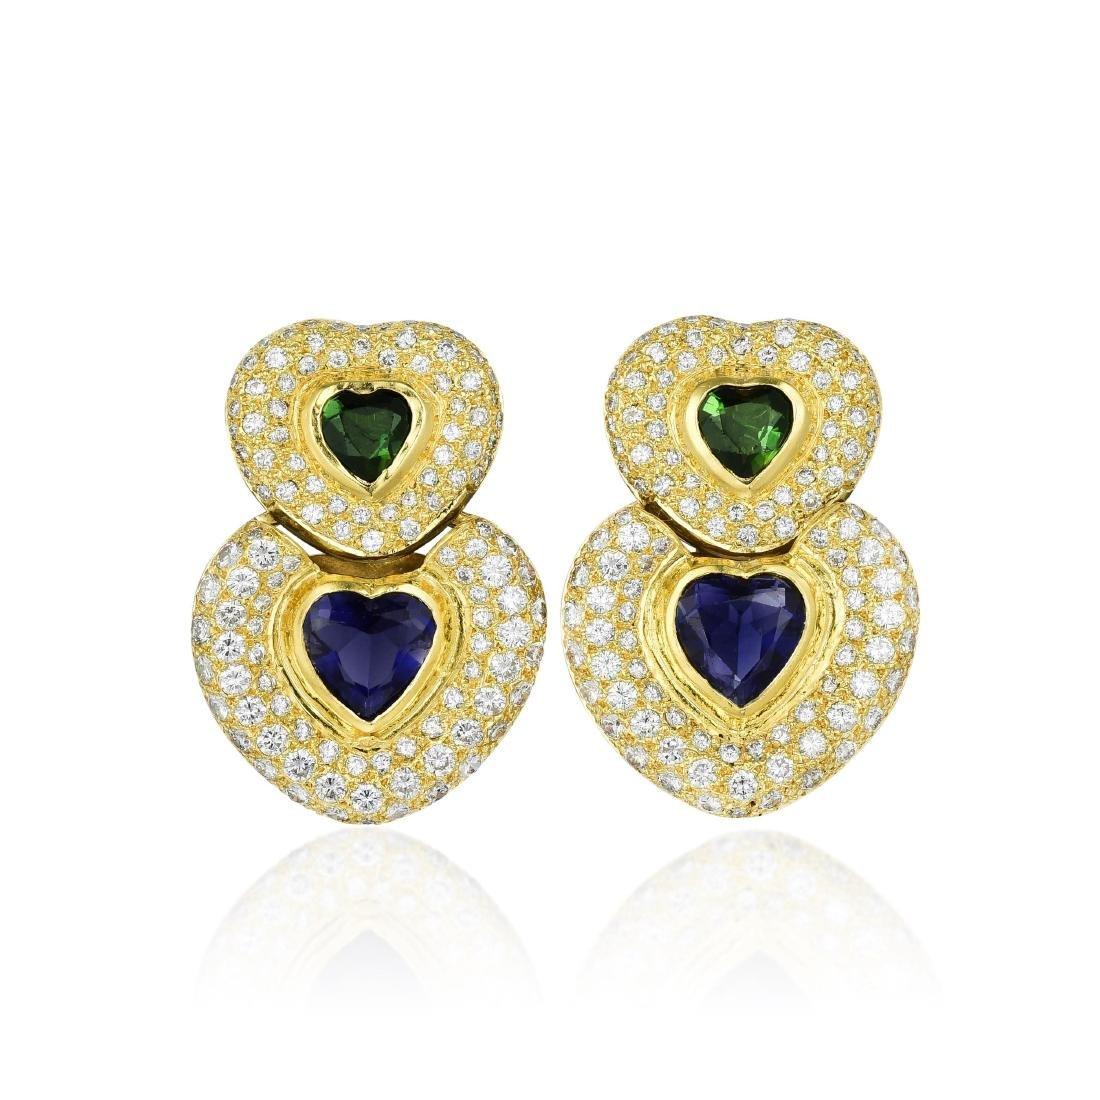 A Pair of 18K Gold Quartz and Diamond Earrings